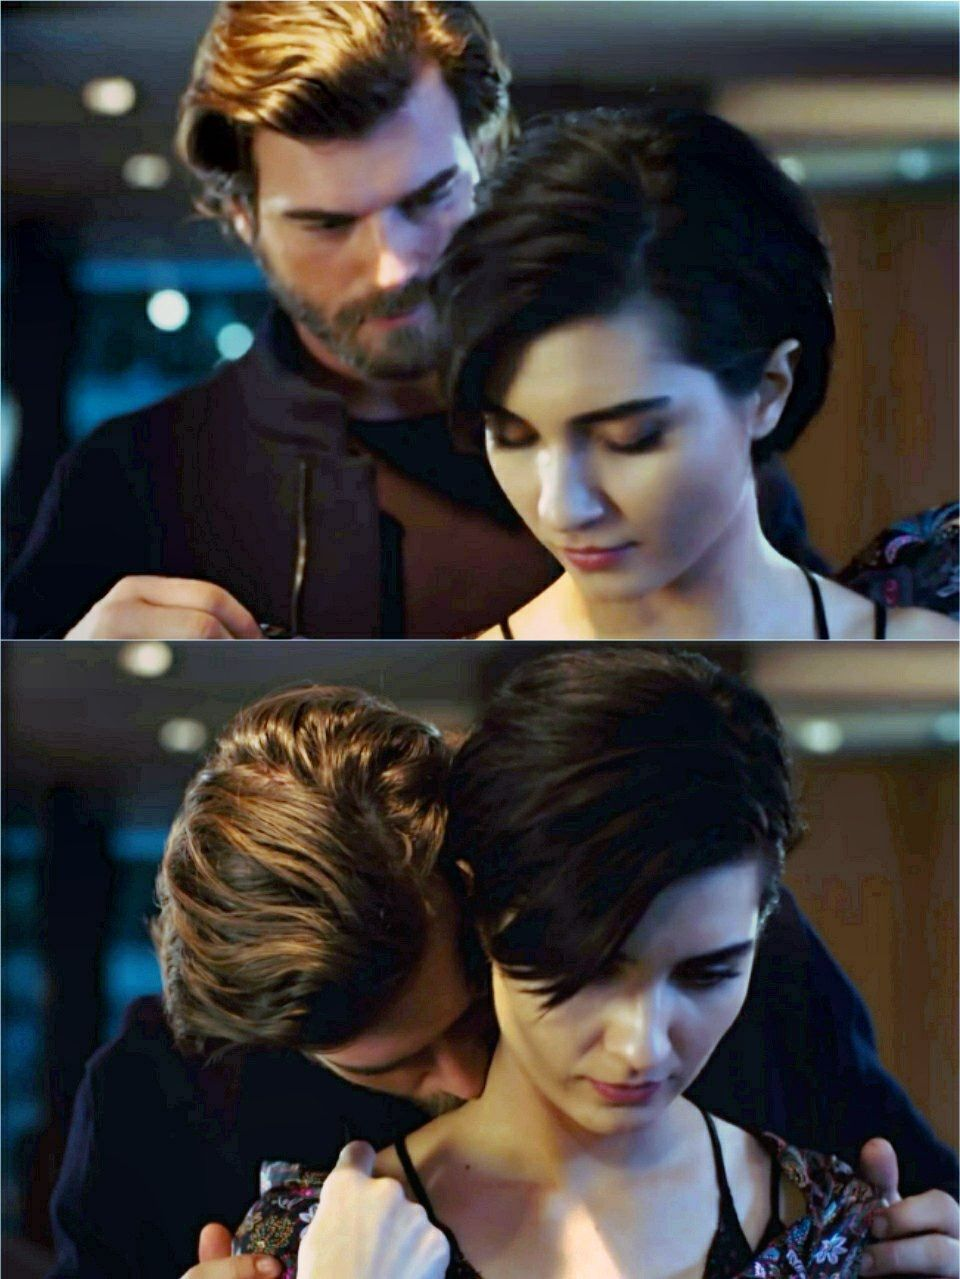 Kivanc Tatlitug As Cesur And Tuba Buyukustun As Suhan In The Turkish Tv Series Cesur Ve Guzel 2016 2017 Actores Telenovela Novelas